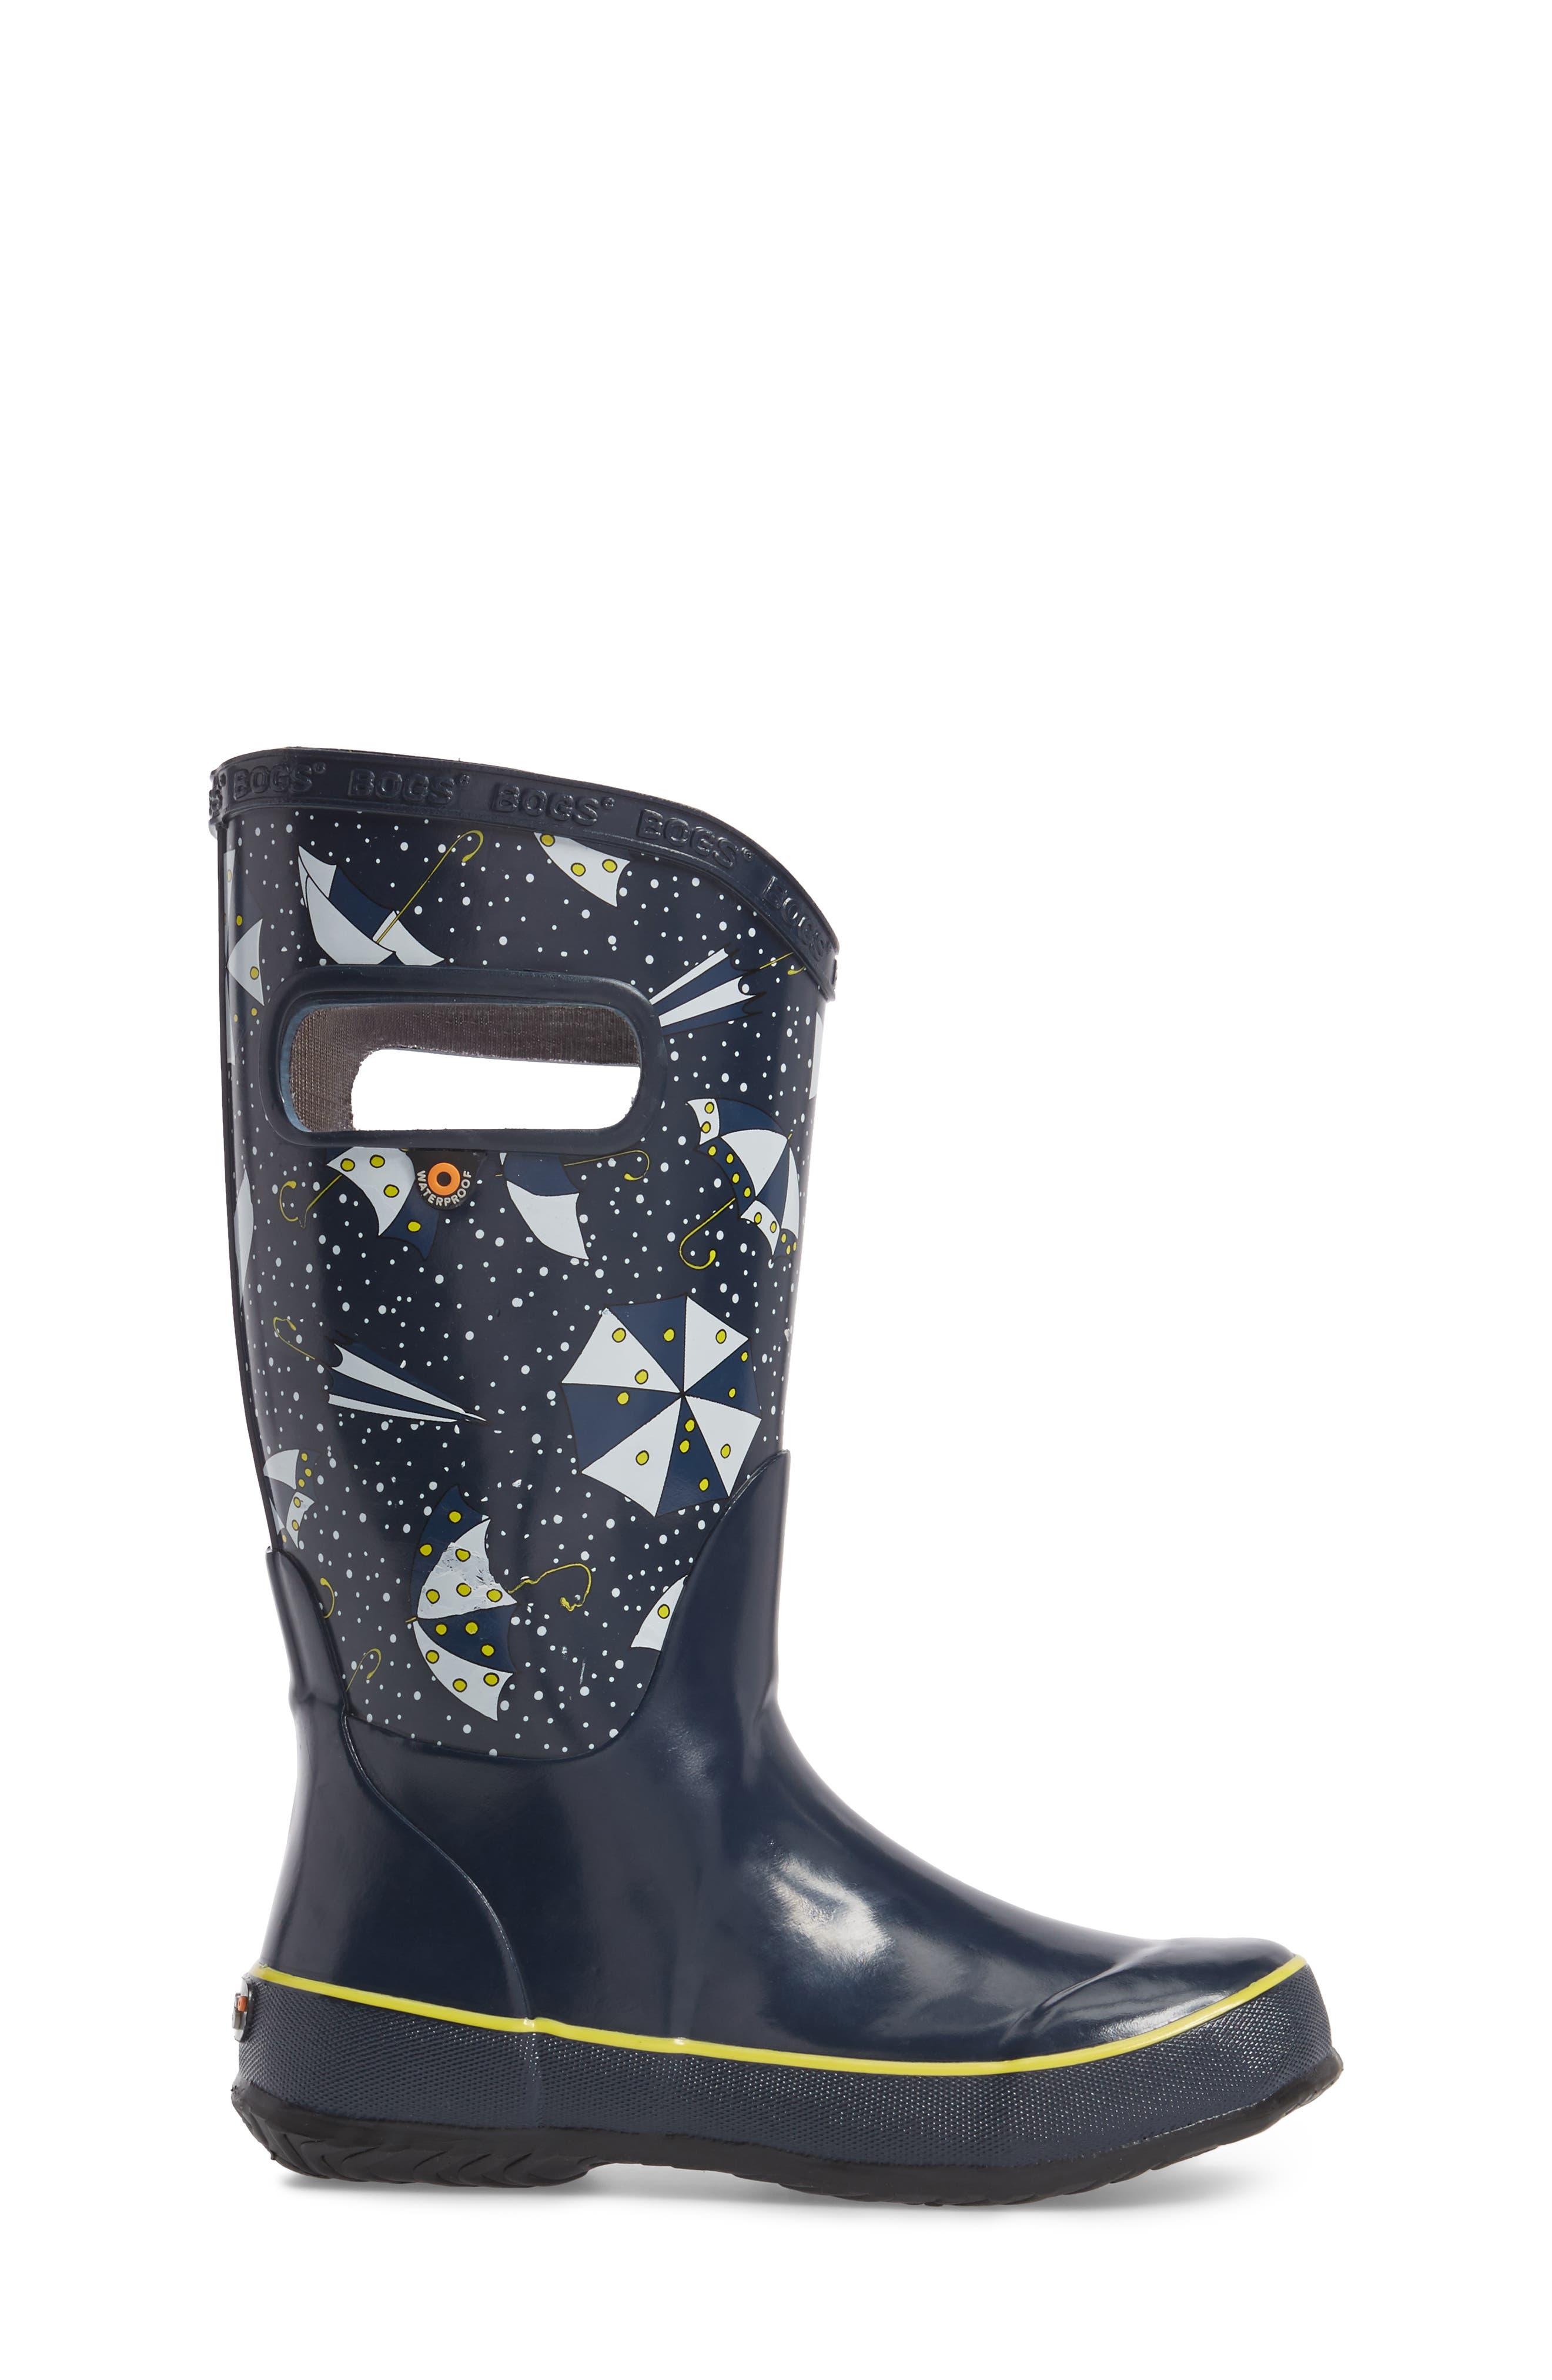 Umbrellas Waterproof Rubber Rain Boot,                             Alternate thumbnail 3, color,                             Dark Blue Multi